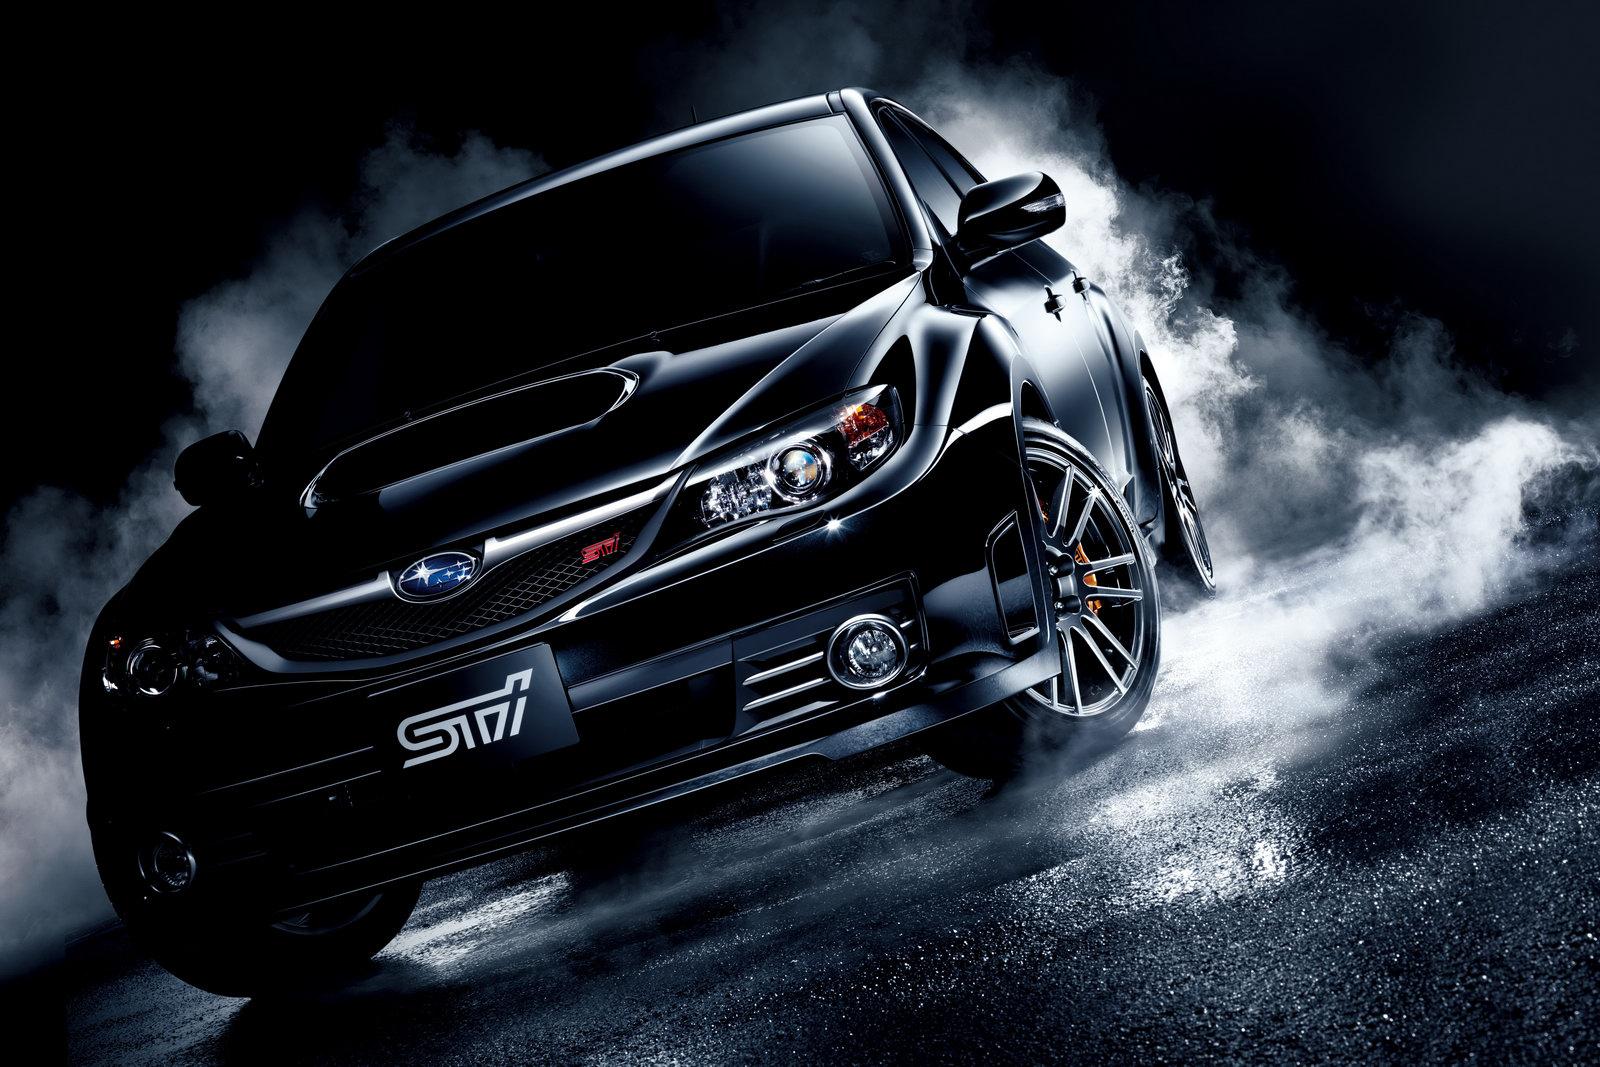 All Bout Cars Subaru Impreza Wrx Sti